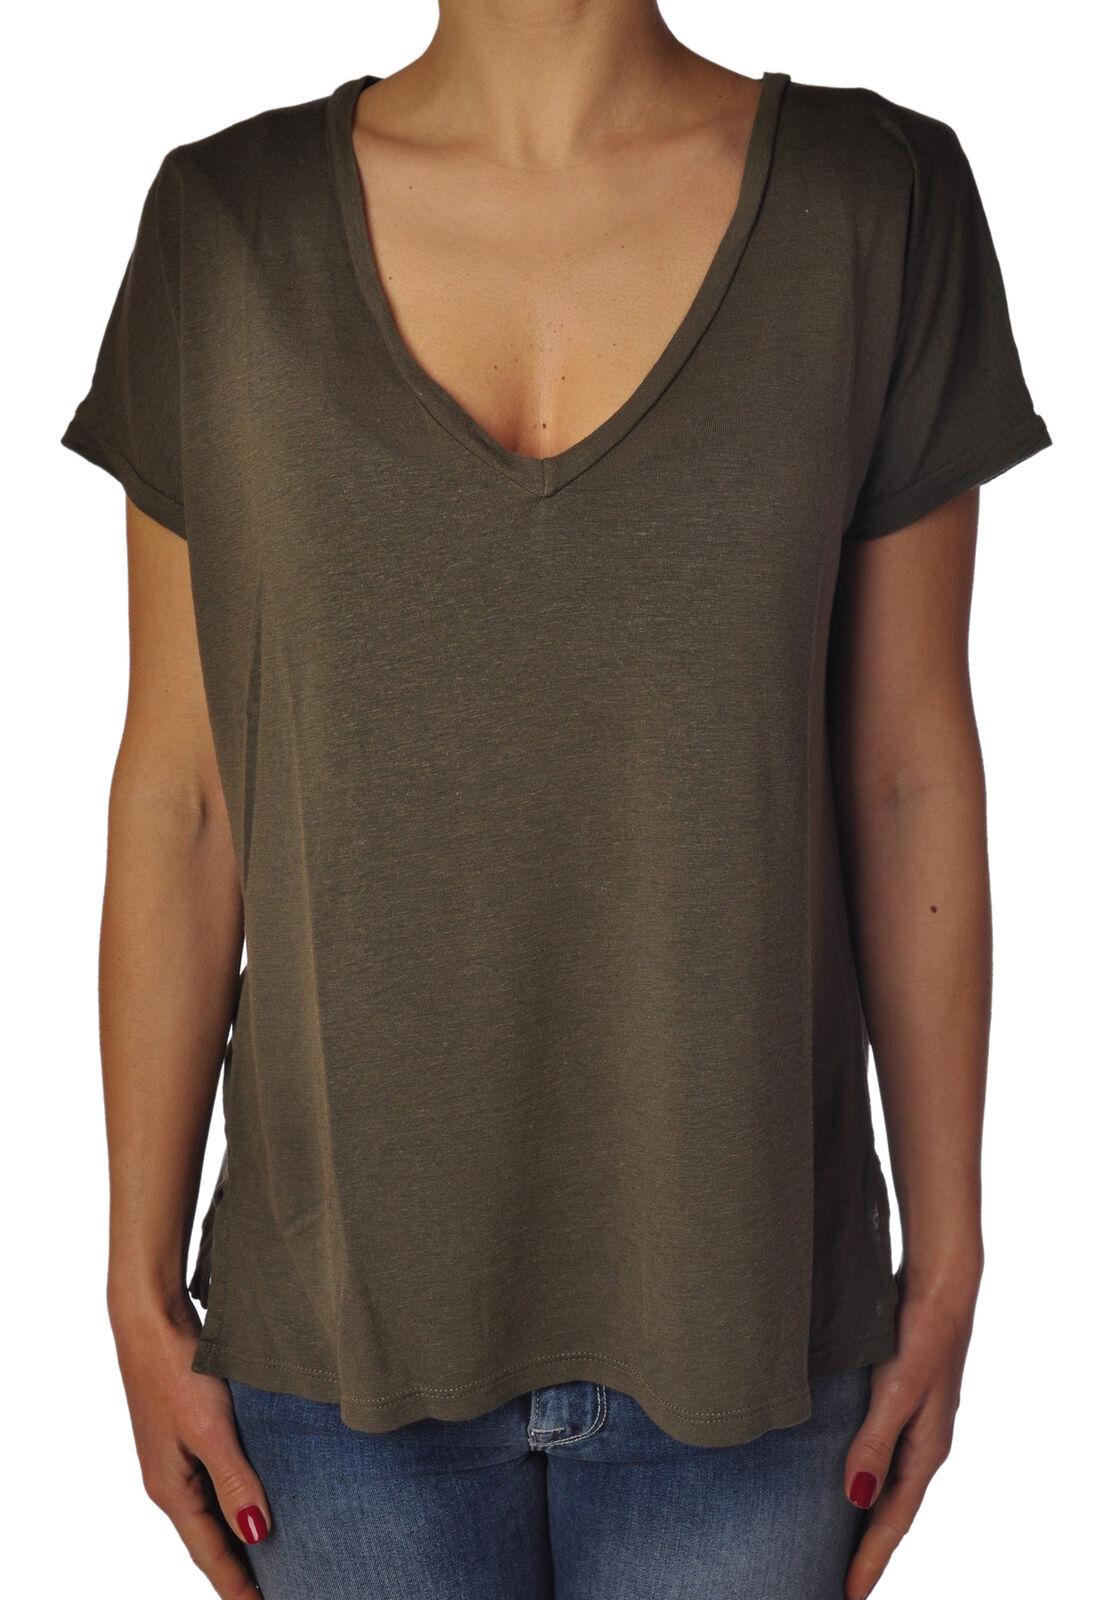 Soallure - Topwear-T-shirts - woman - Grün - 774017C184232